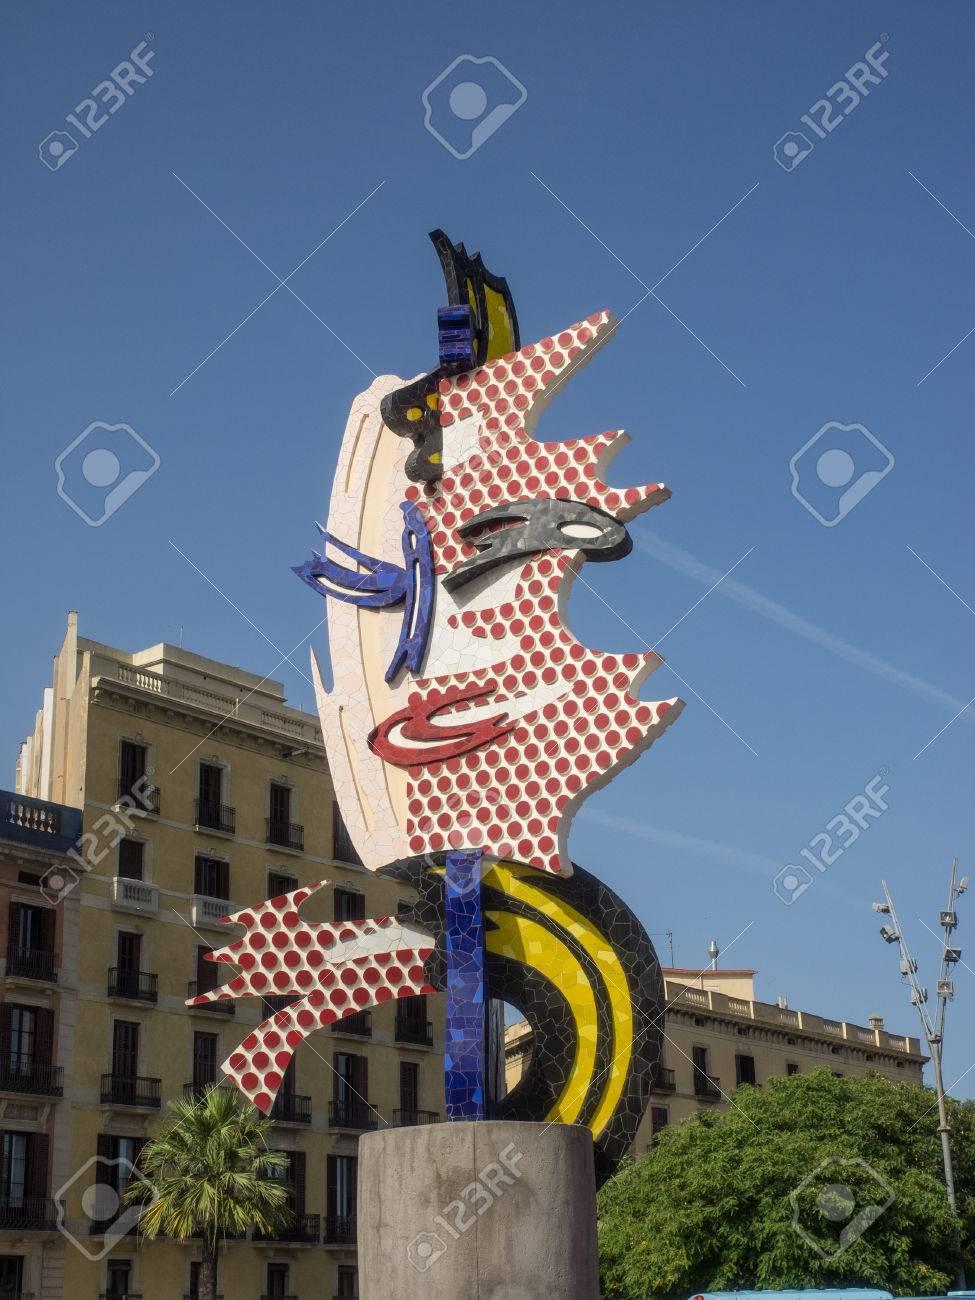 e45d426c29d Stock Photo - The Head of Barcelona